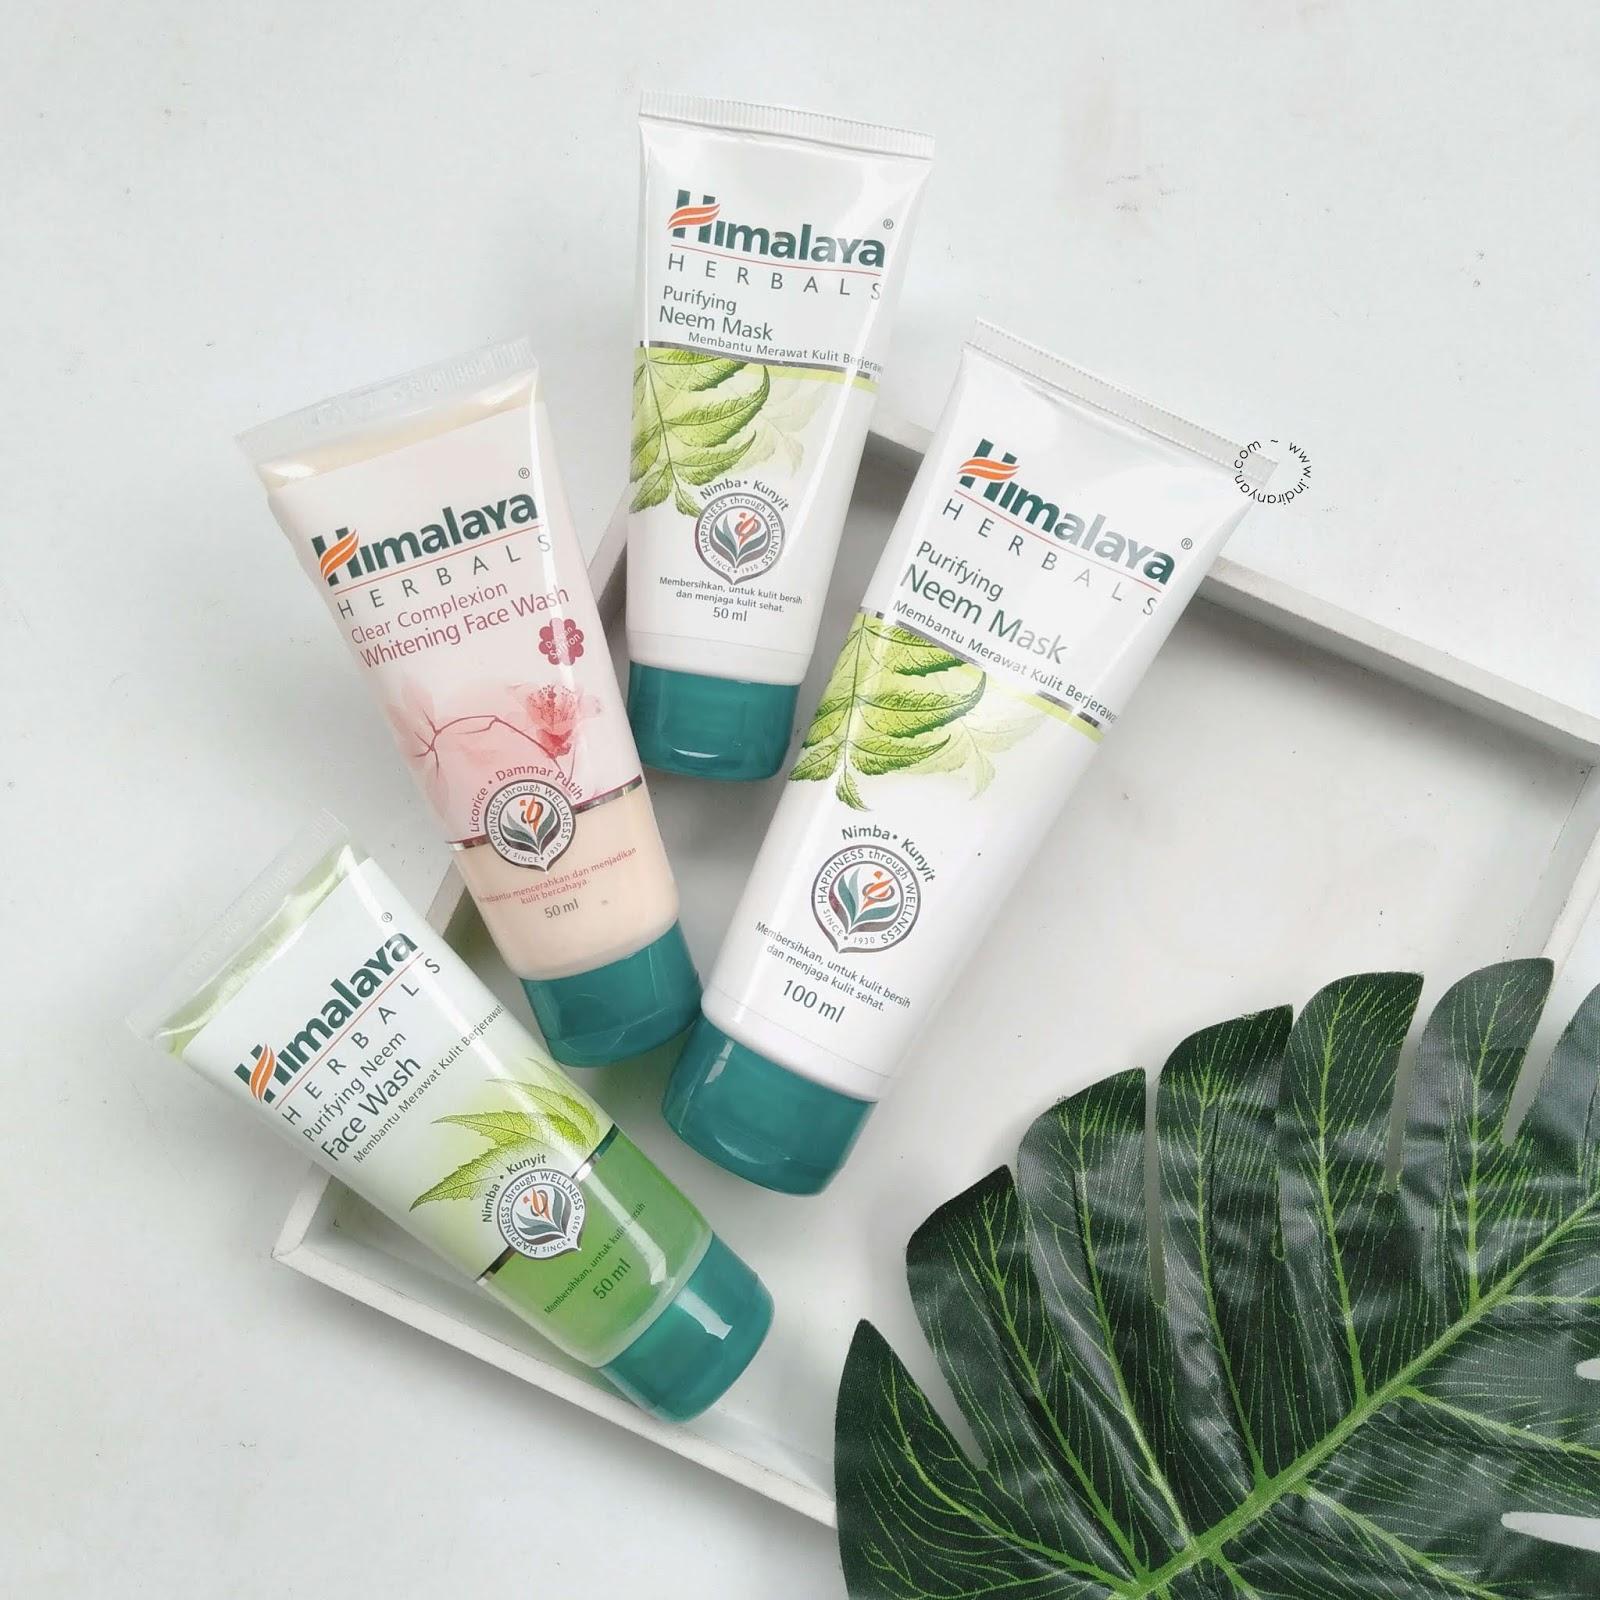 produk-himalaya-herbal-indonesia